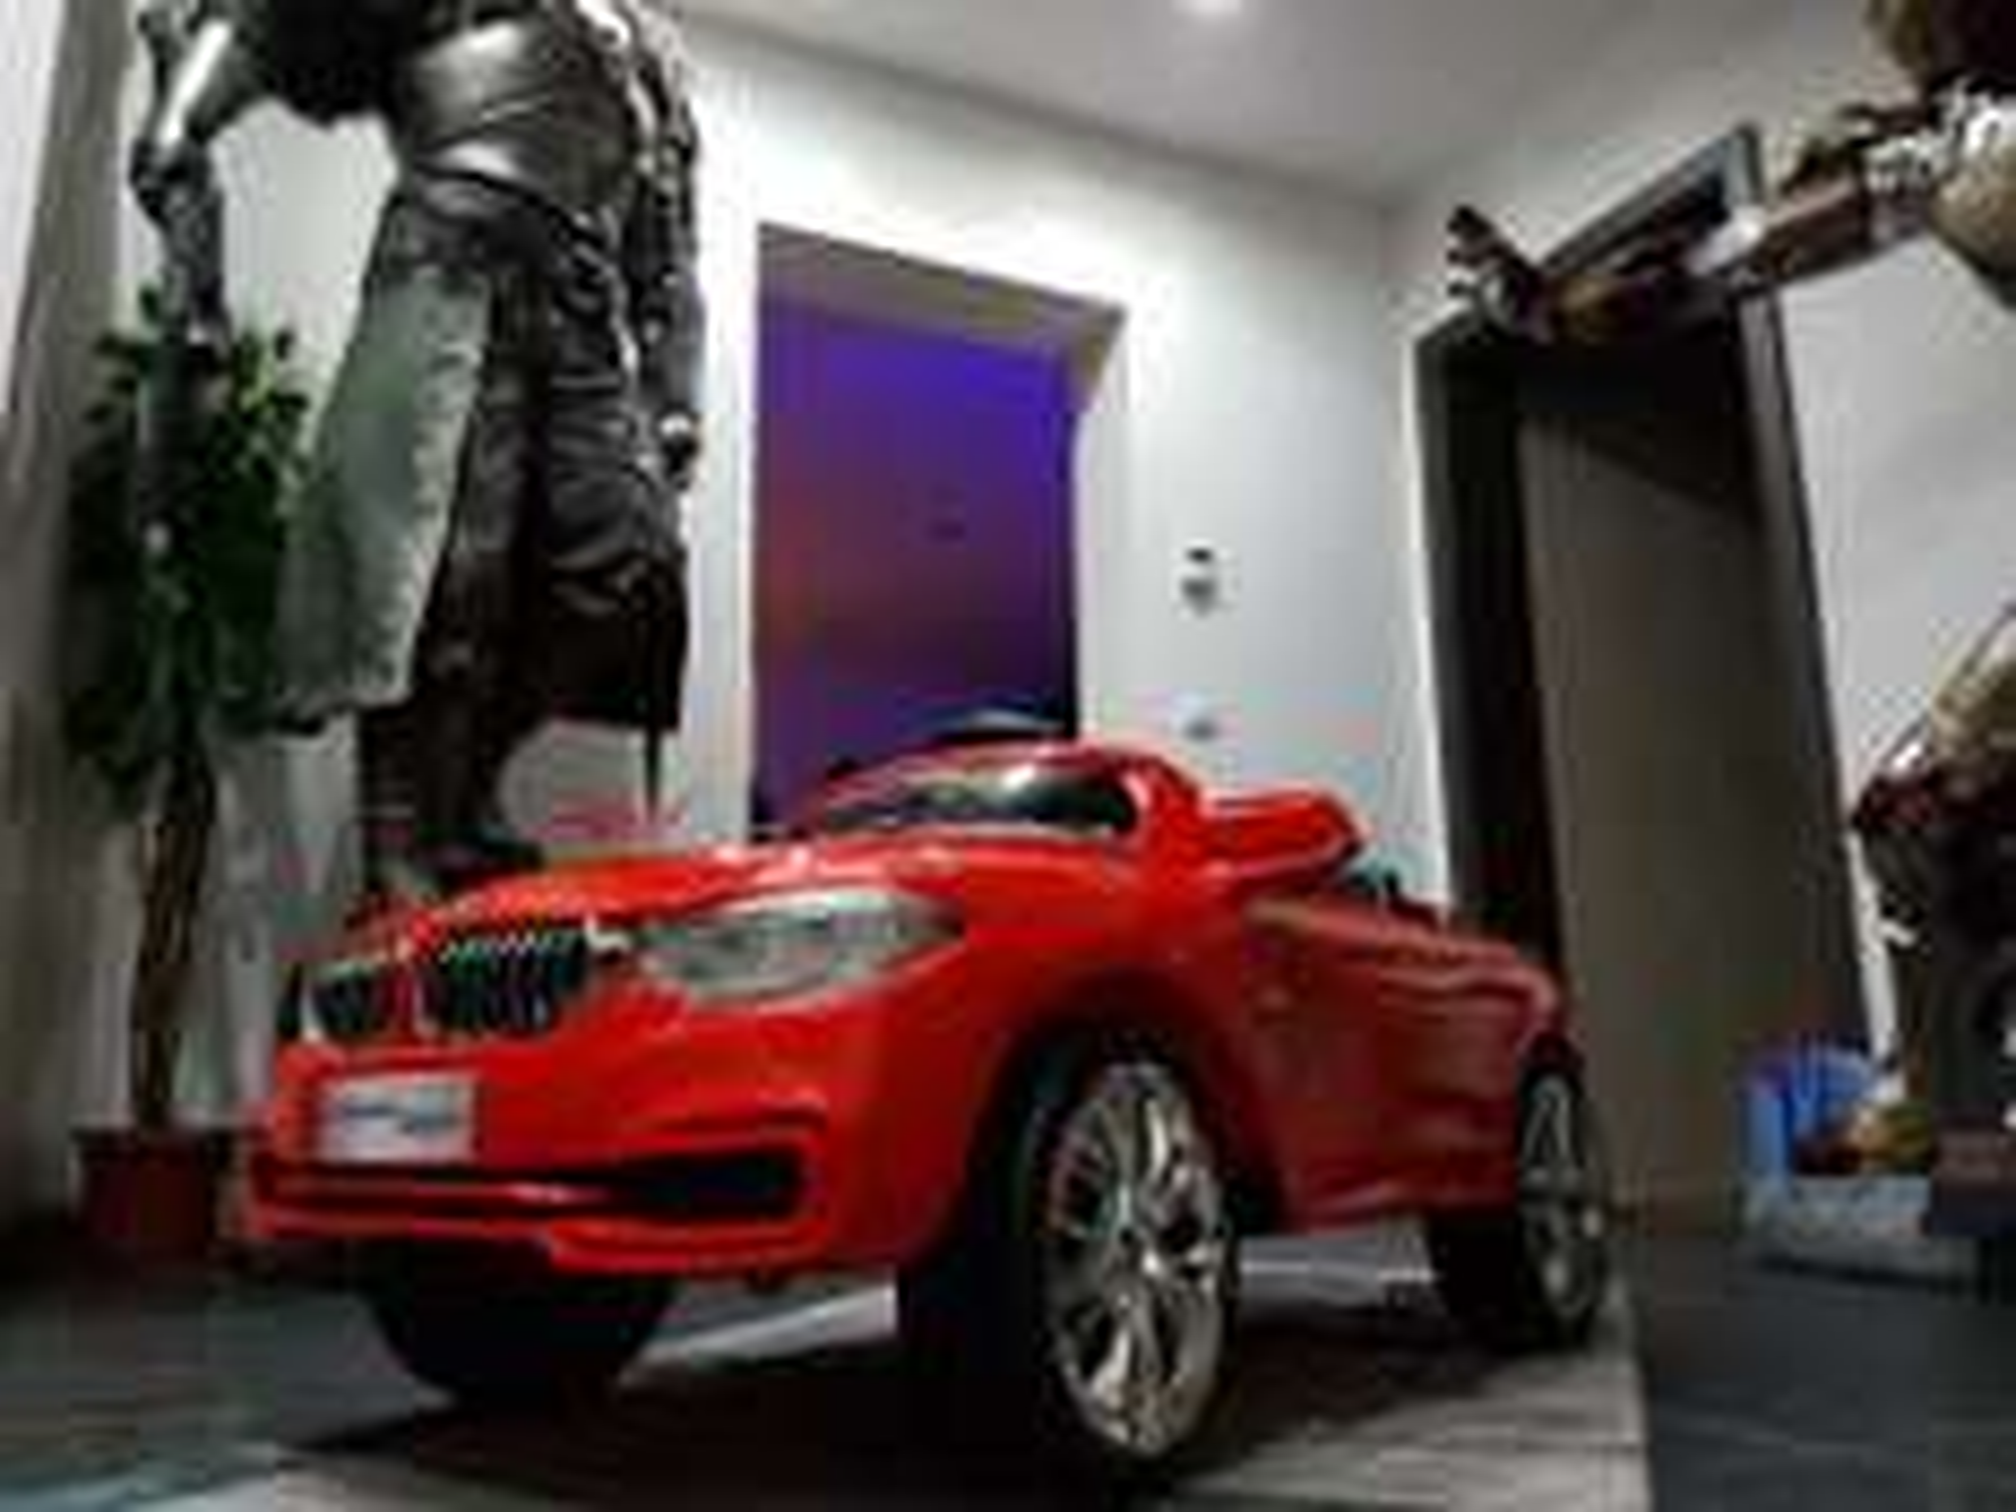 [LOKAL MÖMAX] BMW 4er Coupé Elektro Kinderfahrzeug über Kundenkarte UVP 249€ -> 139€